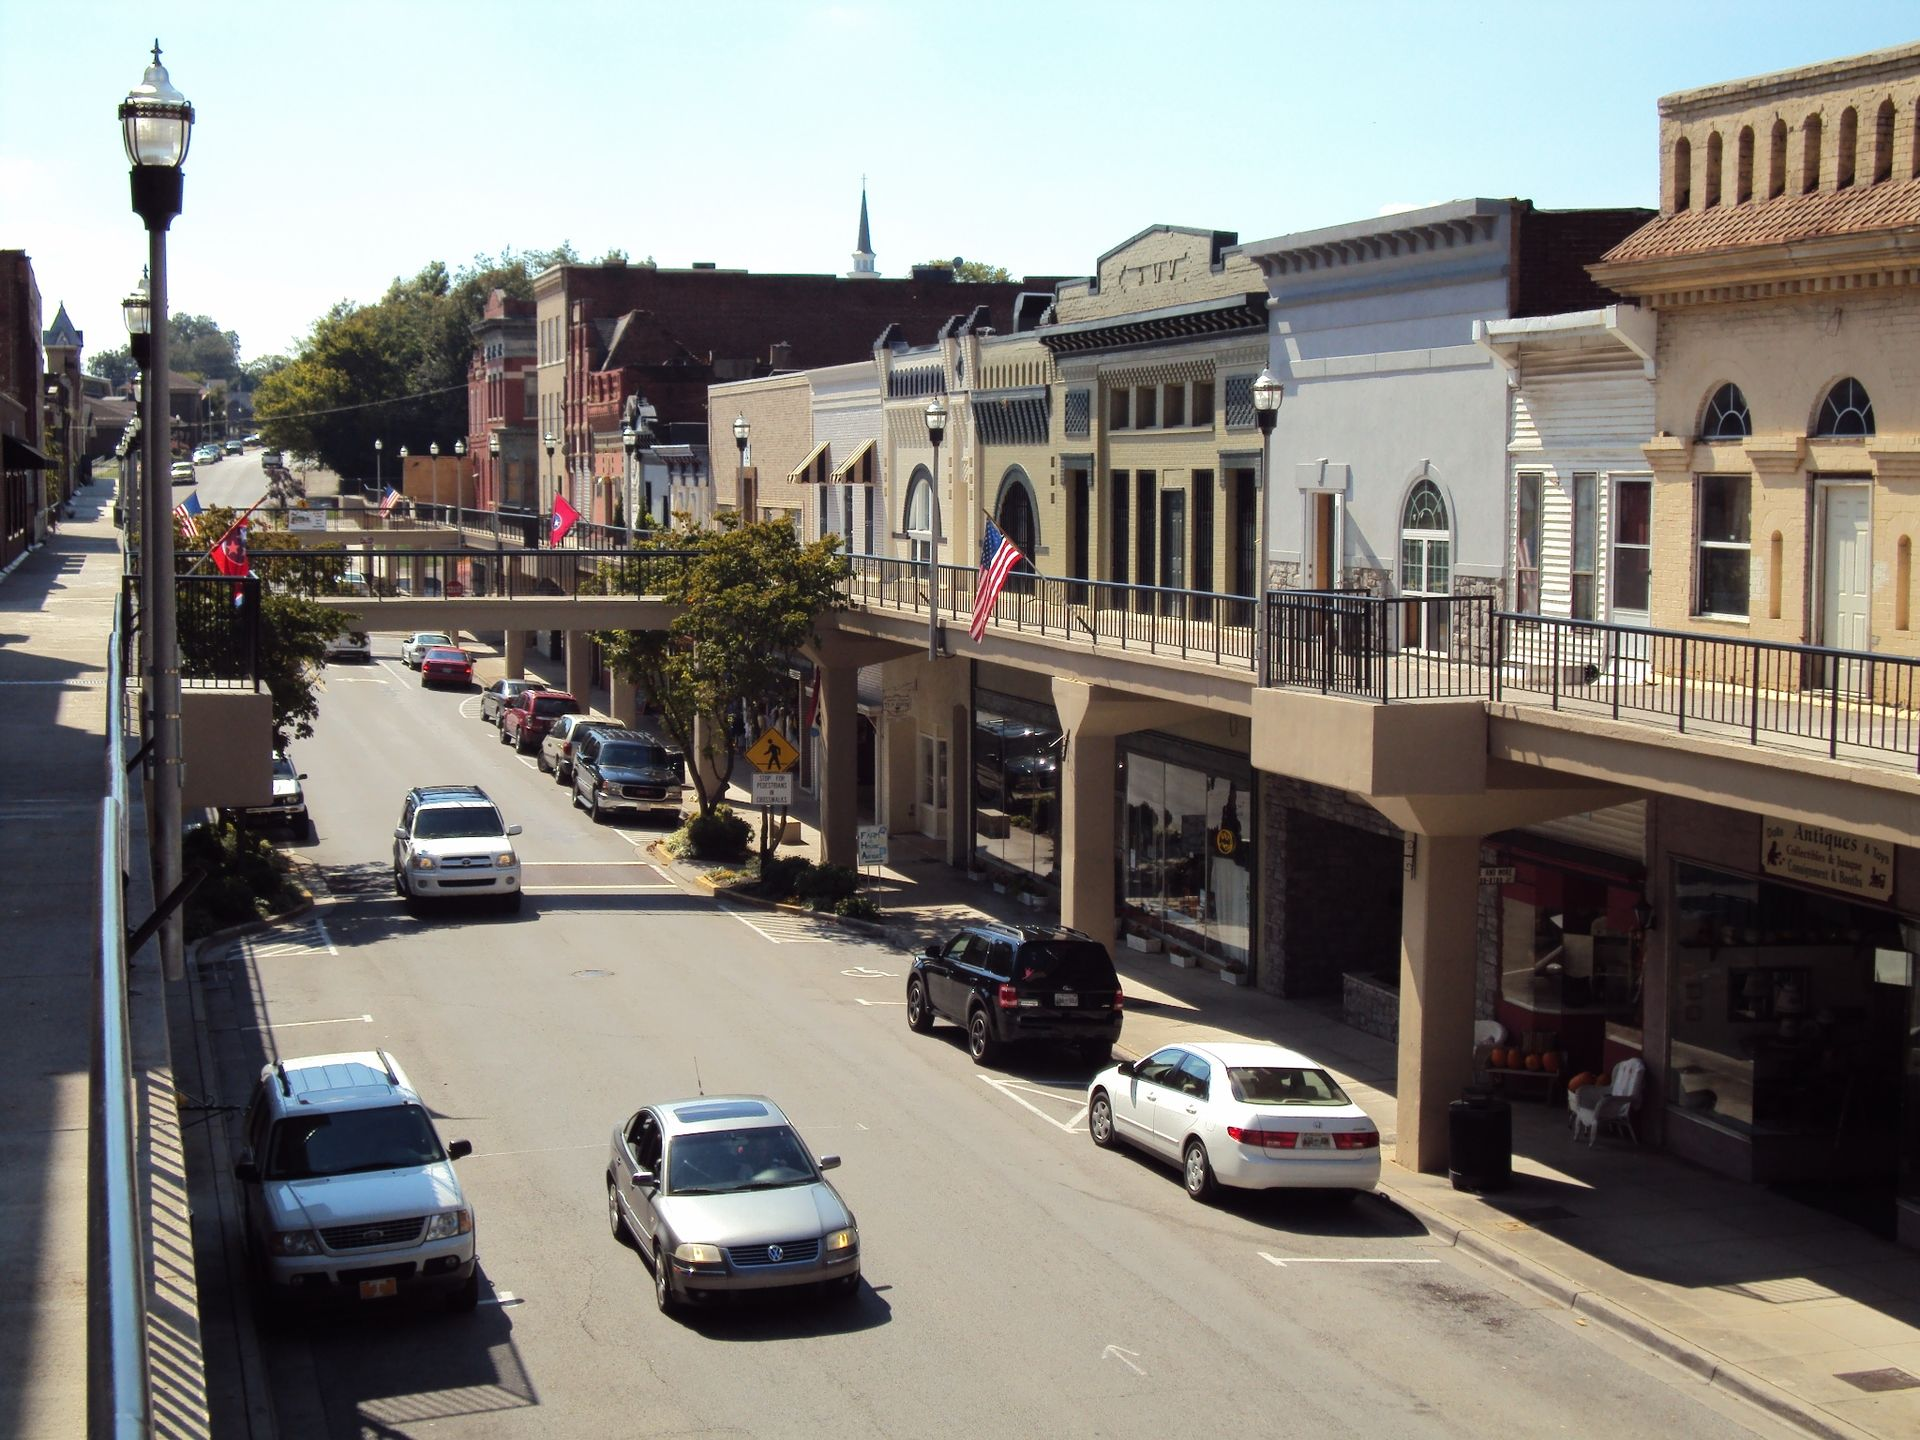 Downtown_Morristown_Tennessee_Overhead_Sidewalks